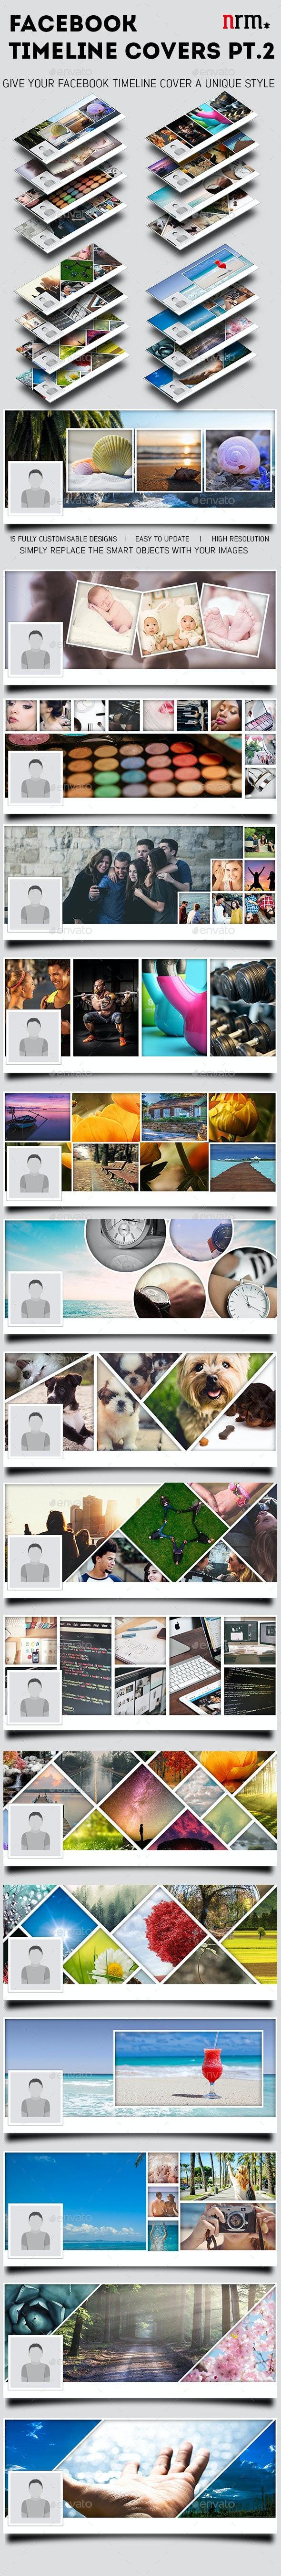 Facebook Timeline Cover Templates - Volume 2 - Social Media Web Elements